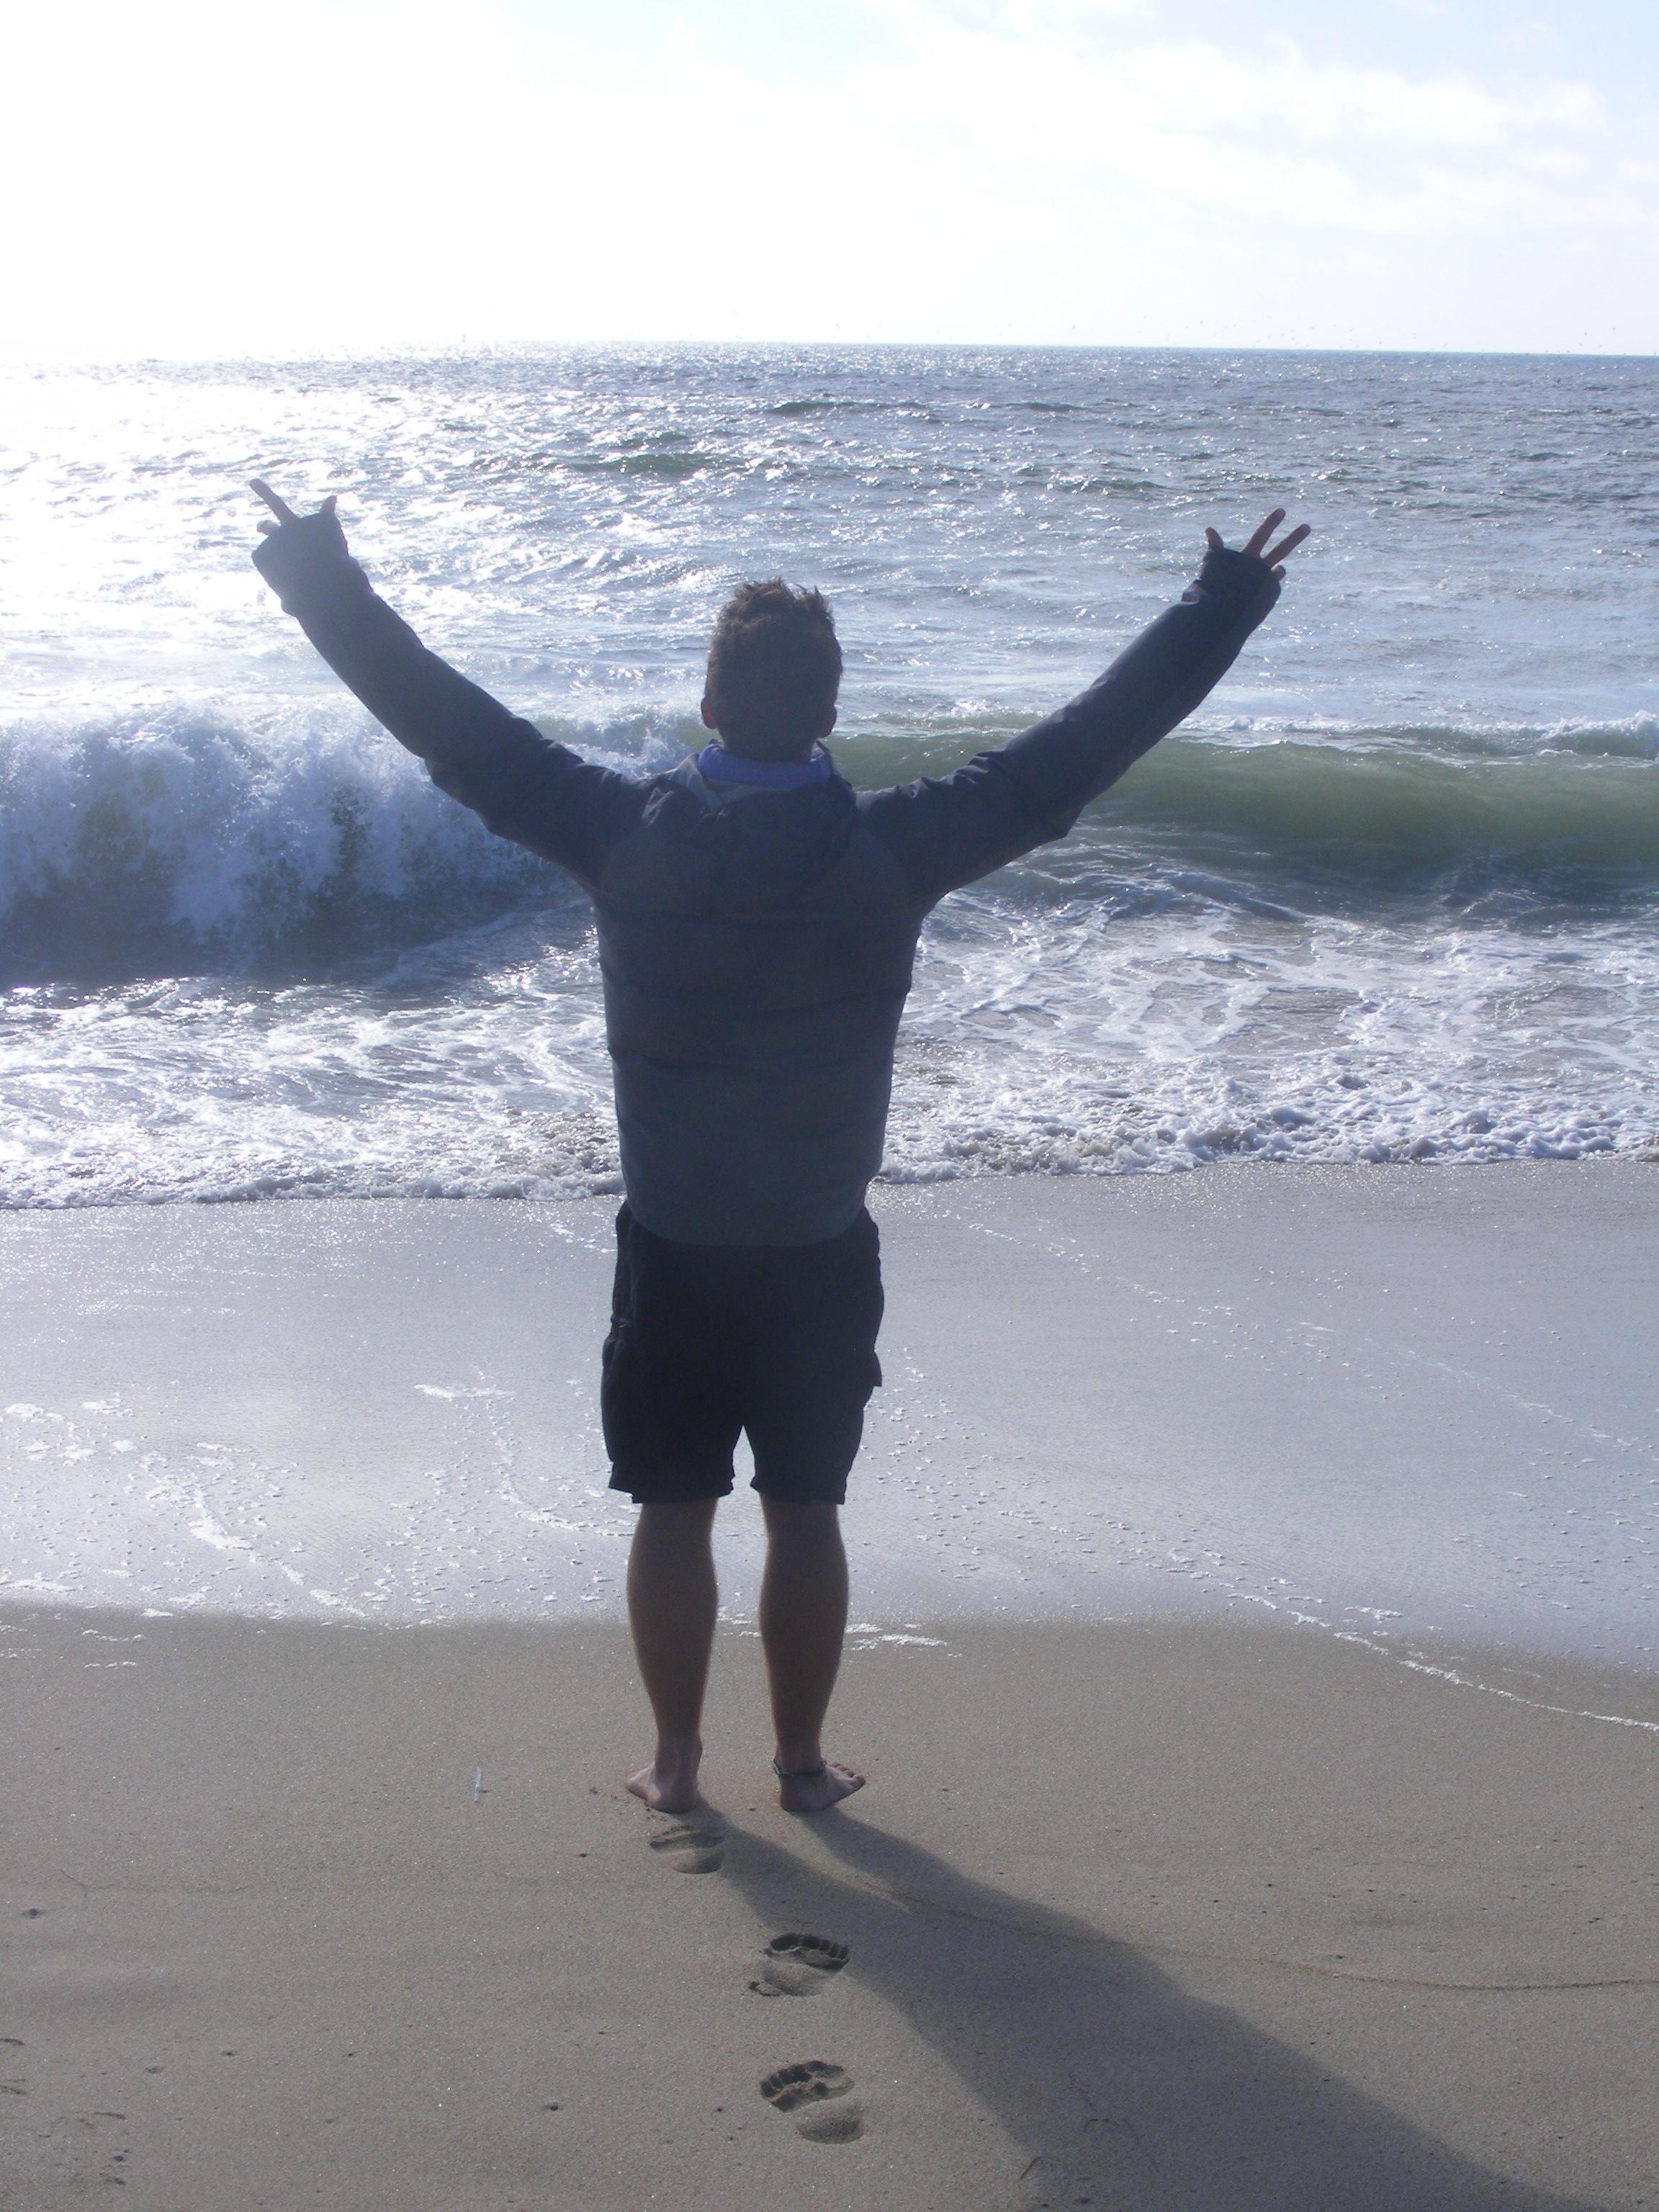 reaching the ocean